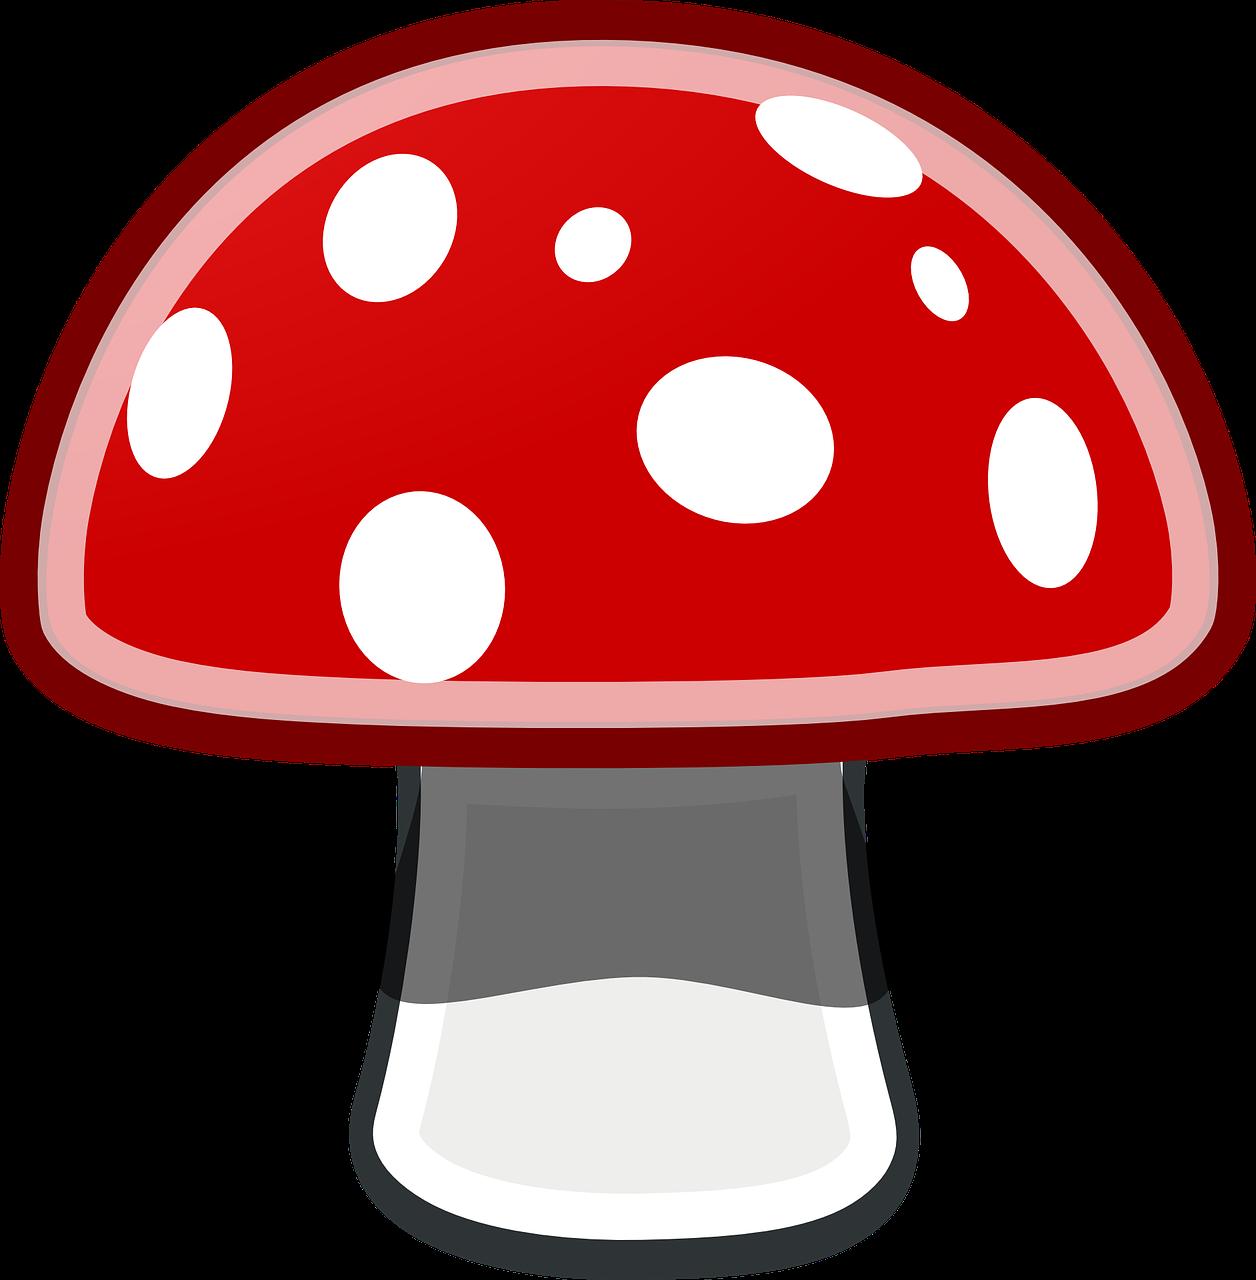 Рисунок мухомора красного